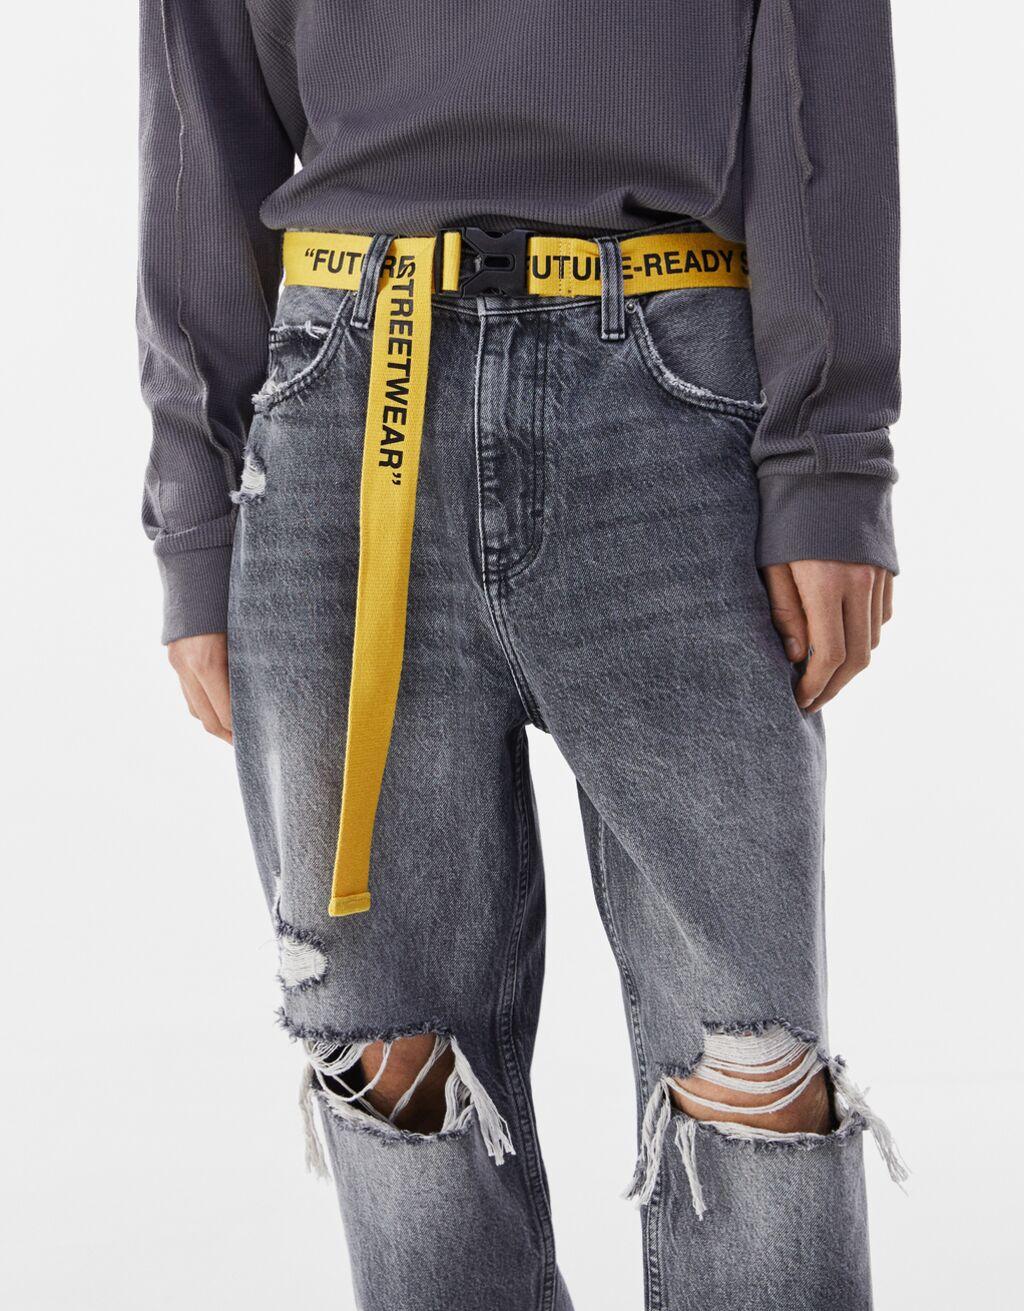 Mens utility belt from Bershka